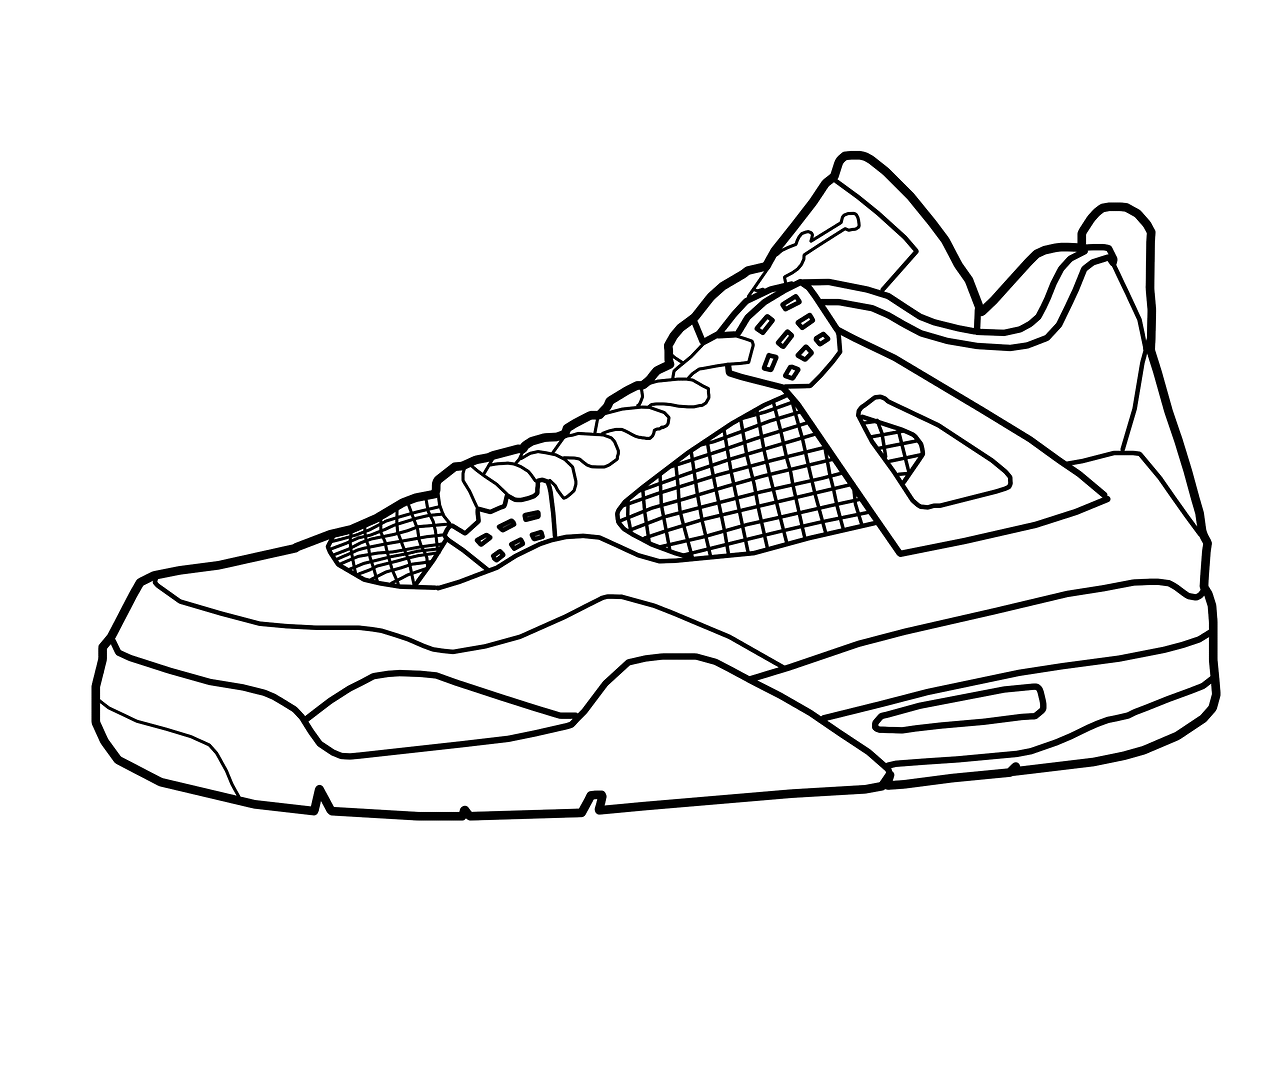 Drawing Jordans Shoes Coloring Pages Pictures Of Shoes Shoes Drawing Jordan Shoes